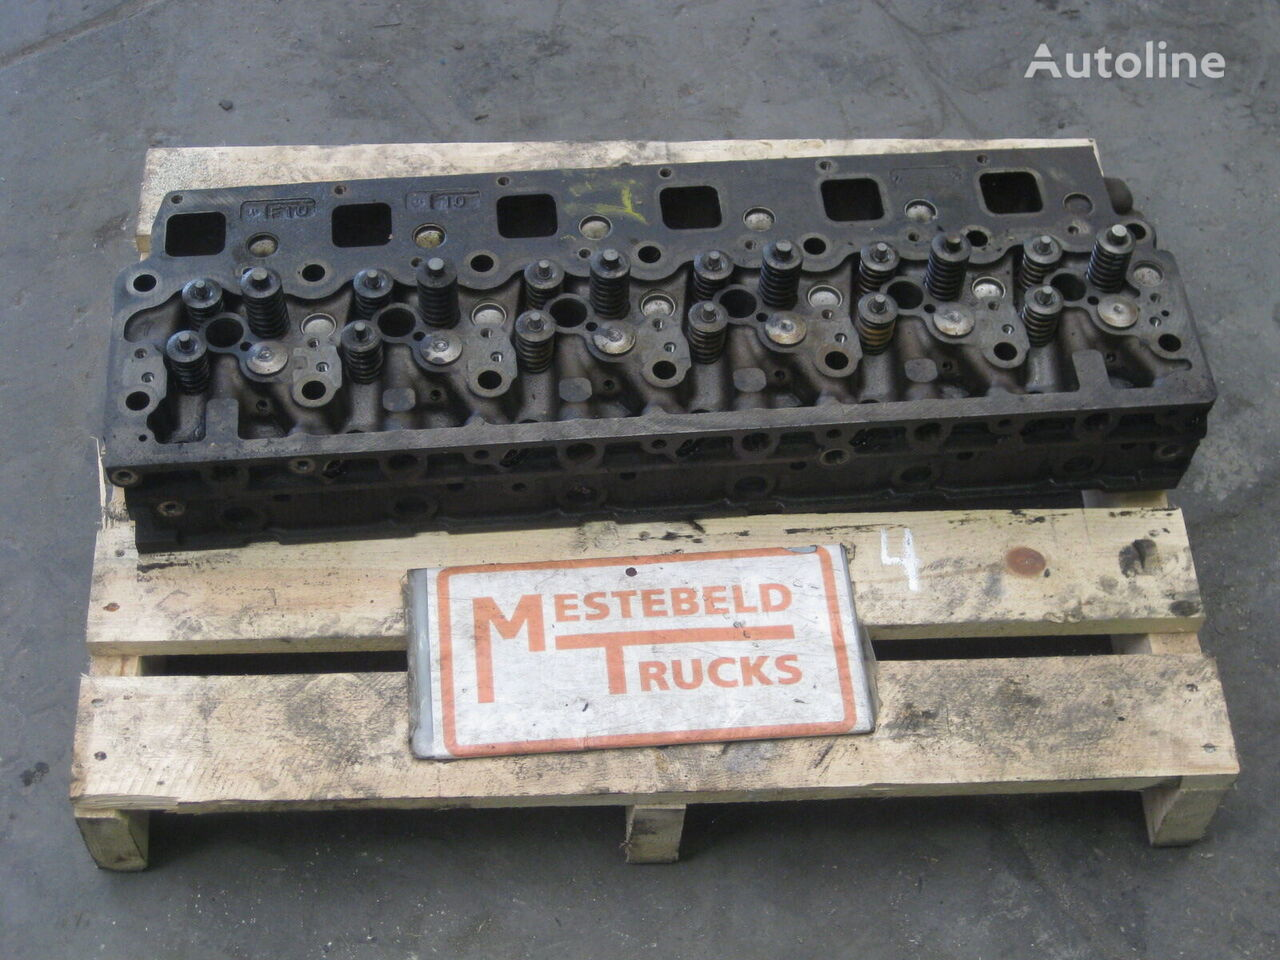 MERCEDES-BENZ Atego kamyon için MERCEDES-BENZ Cilinderkop silindir bloğu